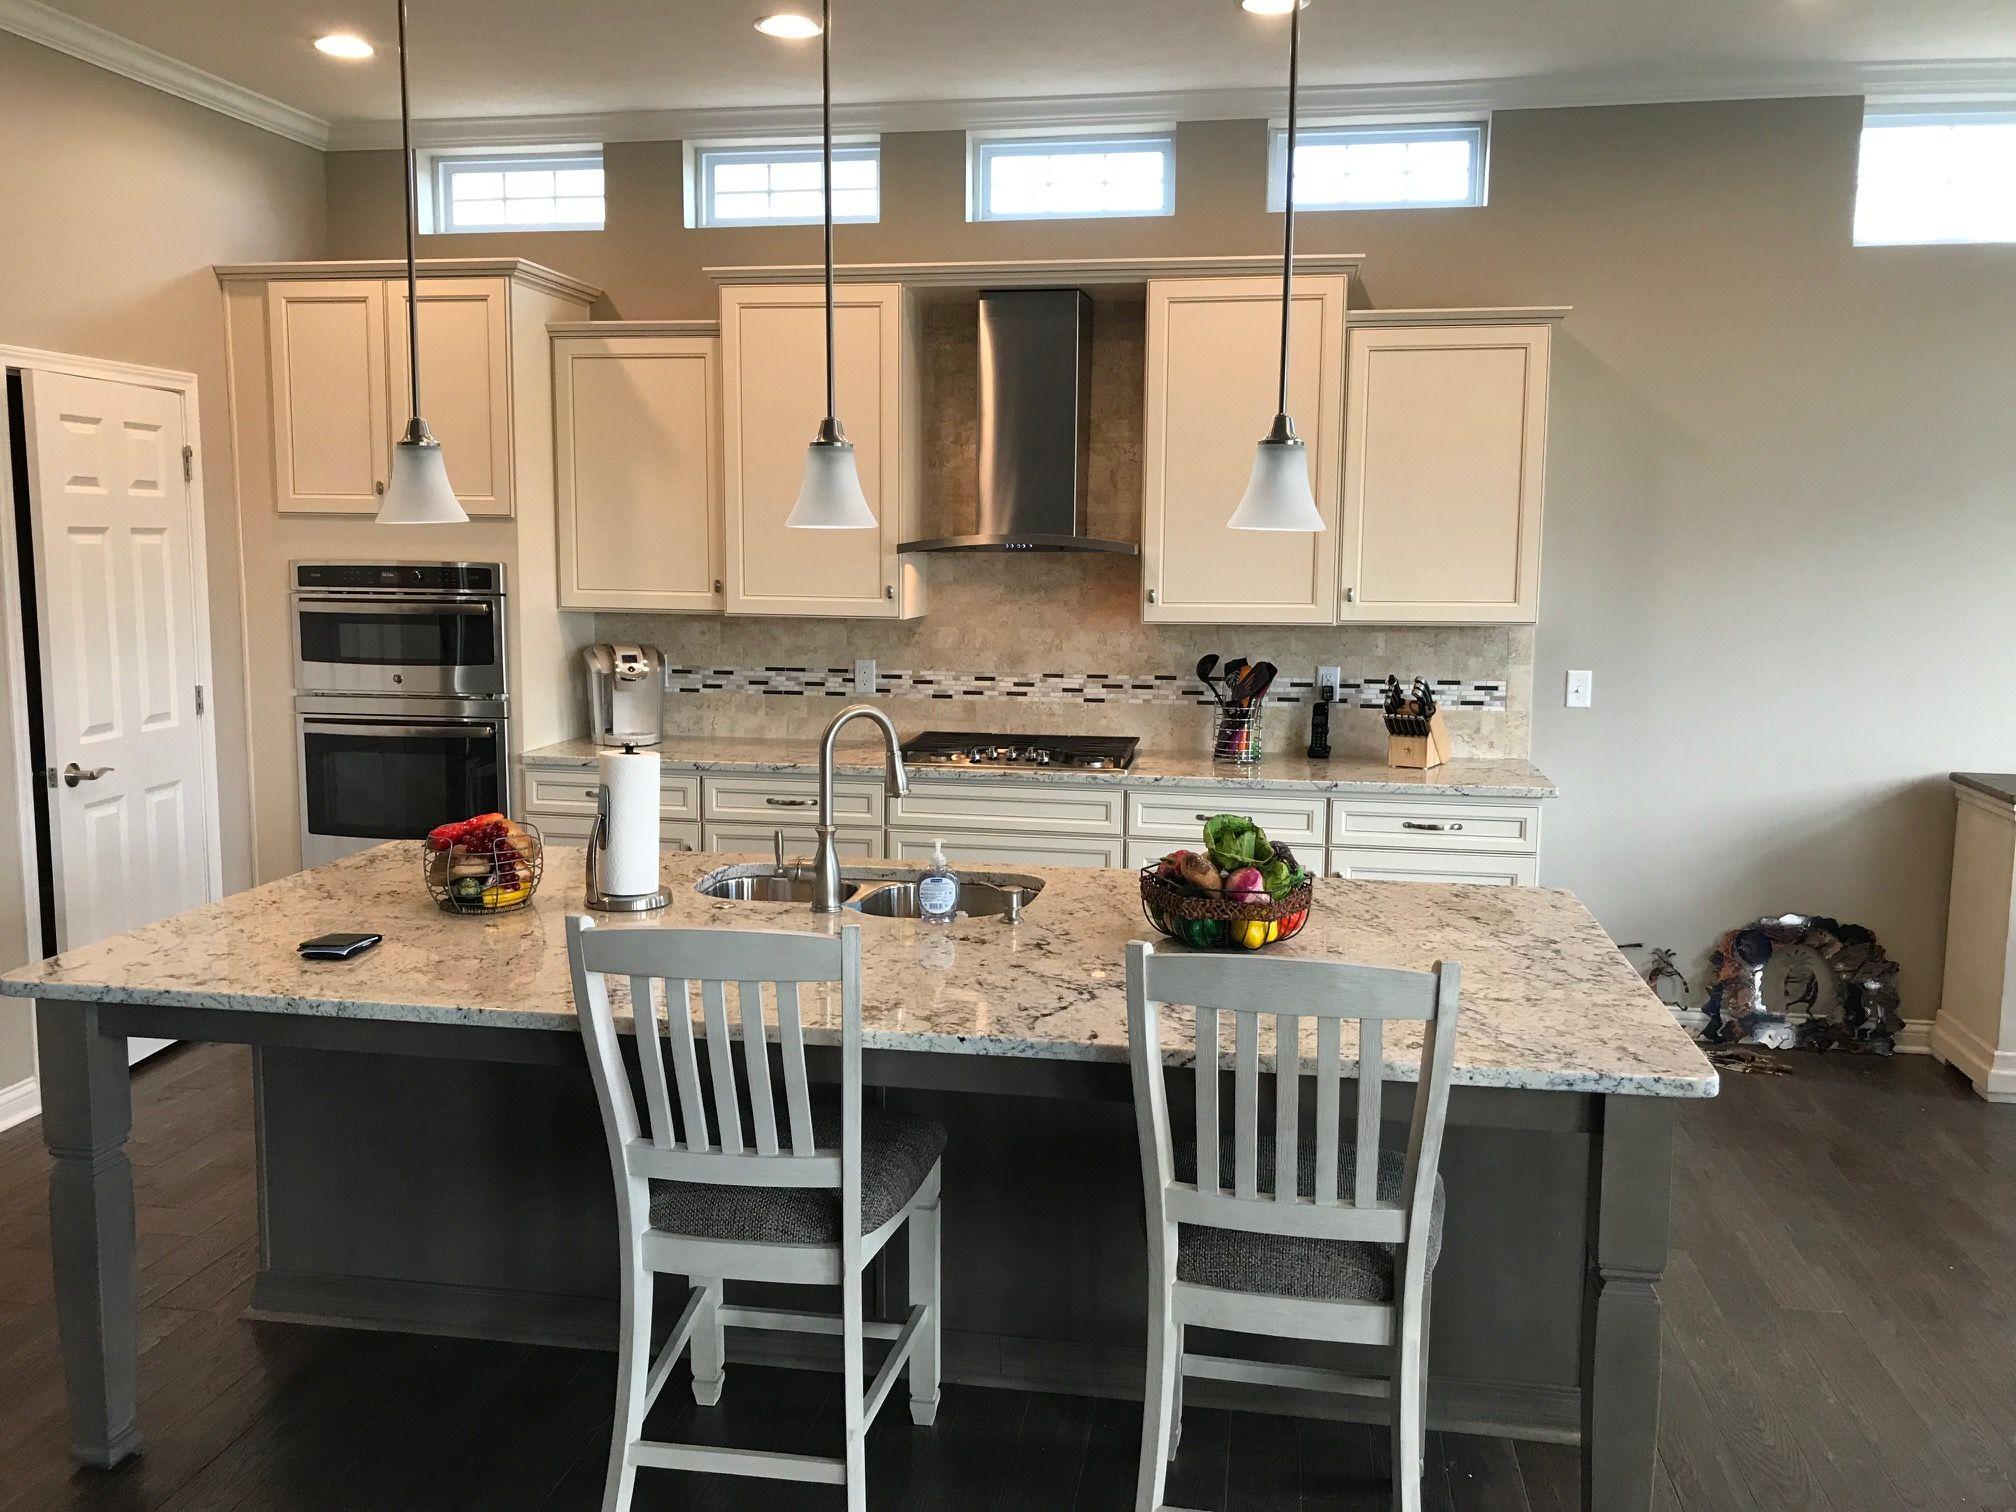 Chimney Hood With Crown Gourmet Kitchen Kitchen Cabinets Gourmet Kitchens Home Decor